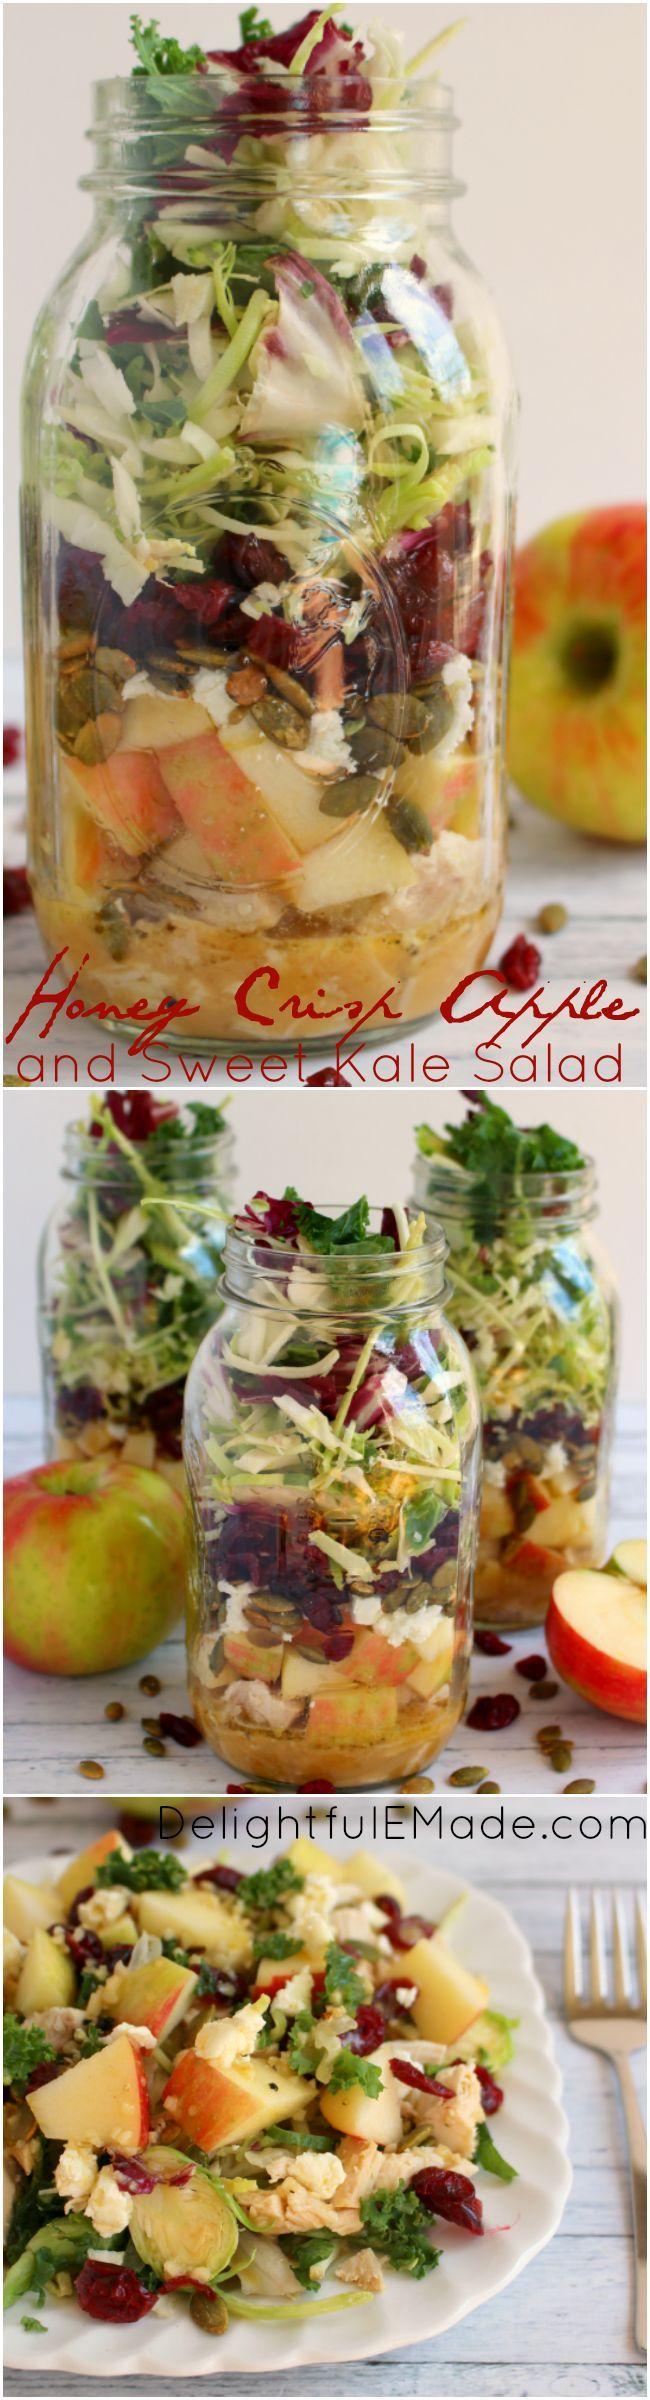 Best 25+ Kale salads ideas on Pinterest | Kale salad, Kale ...